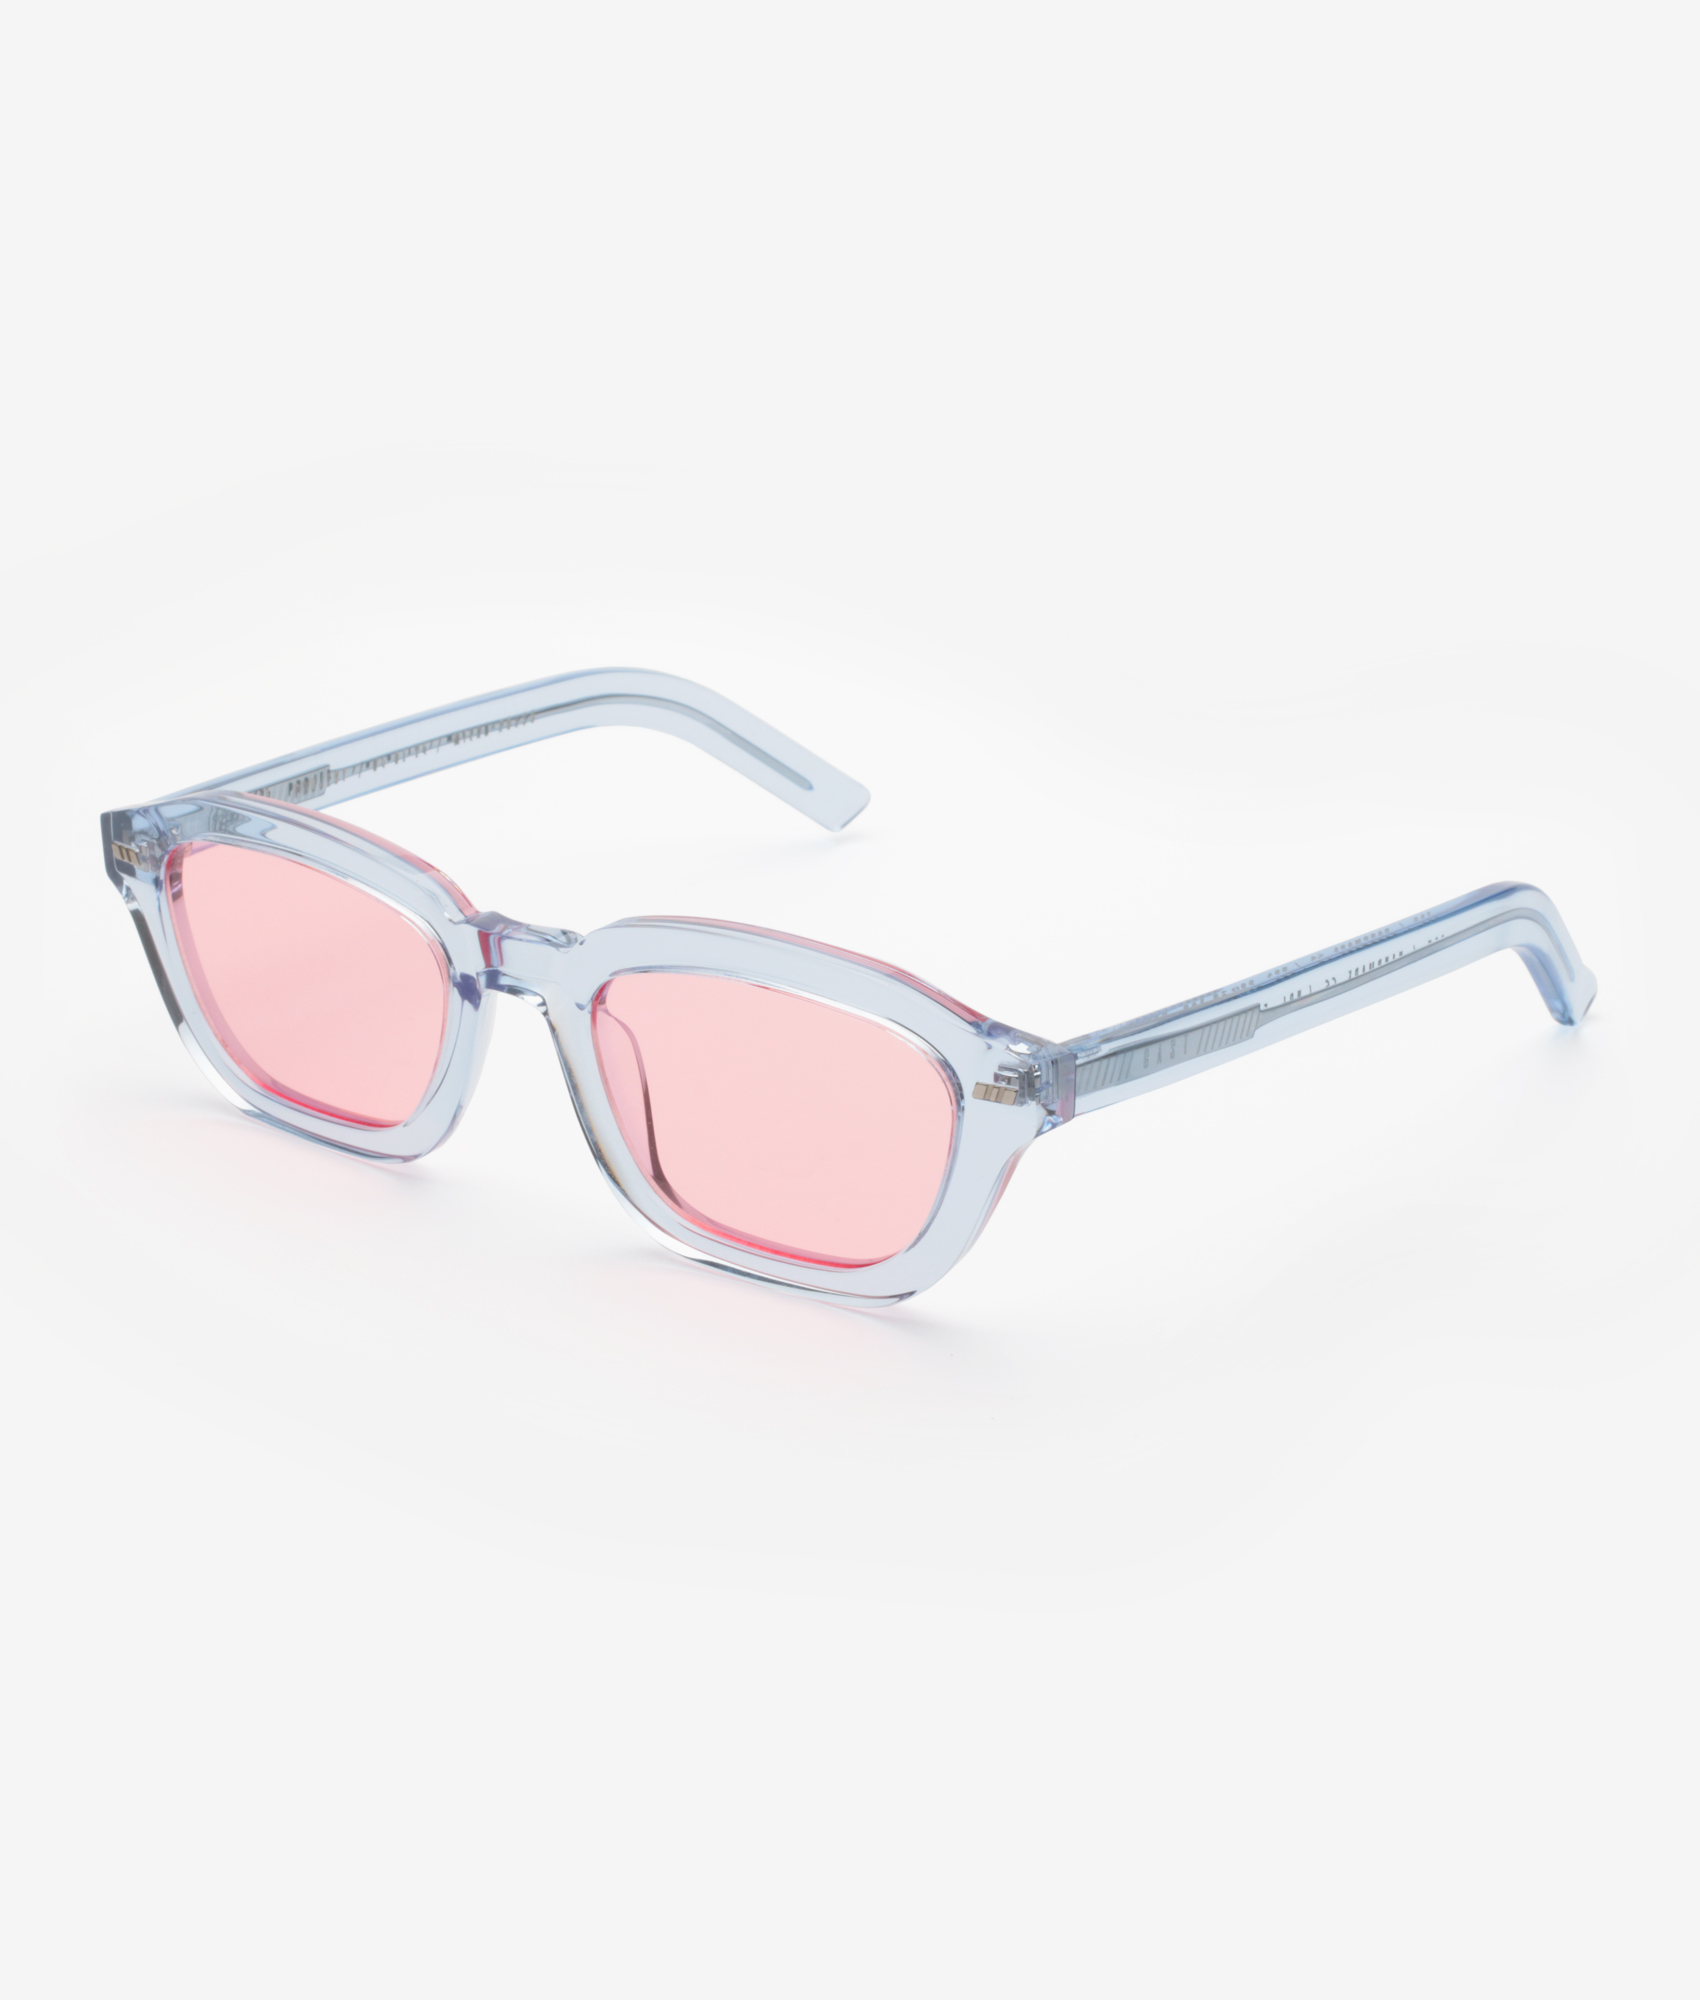 Fen Ice Gast Sunglasses